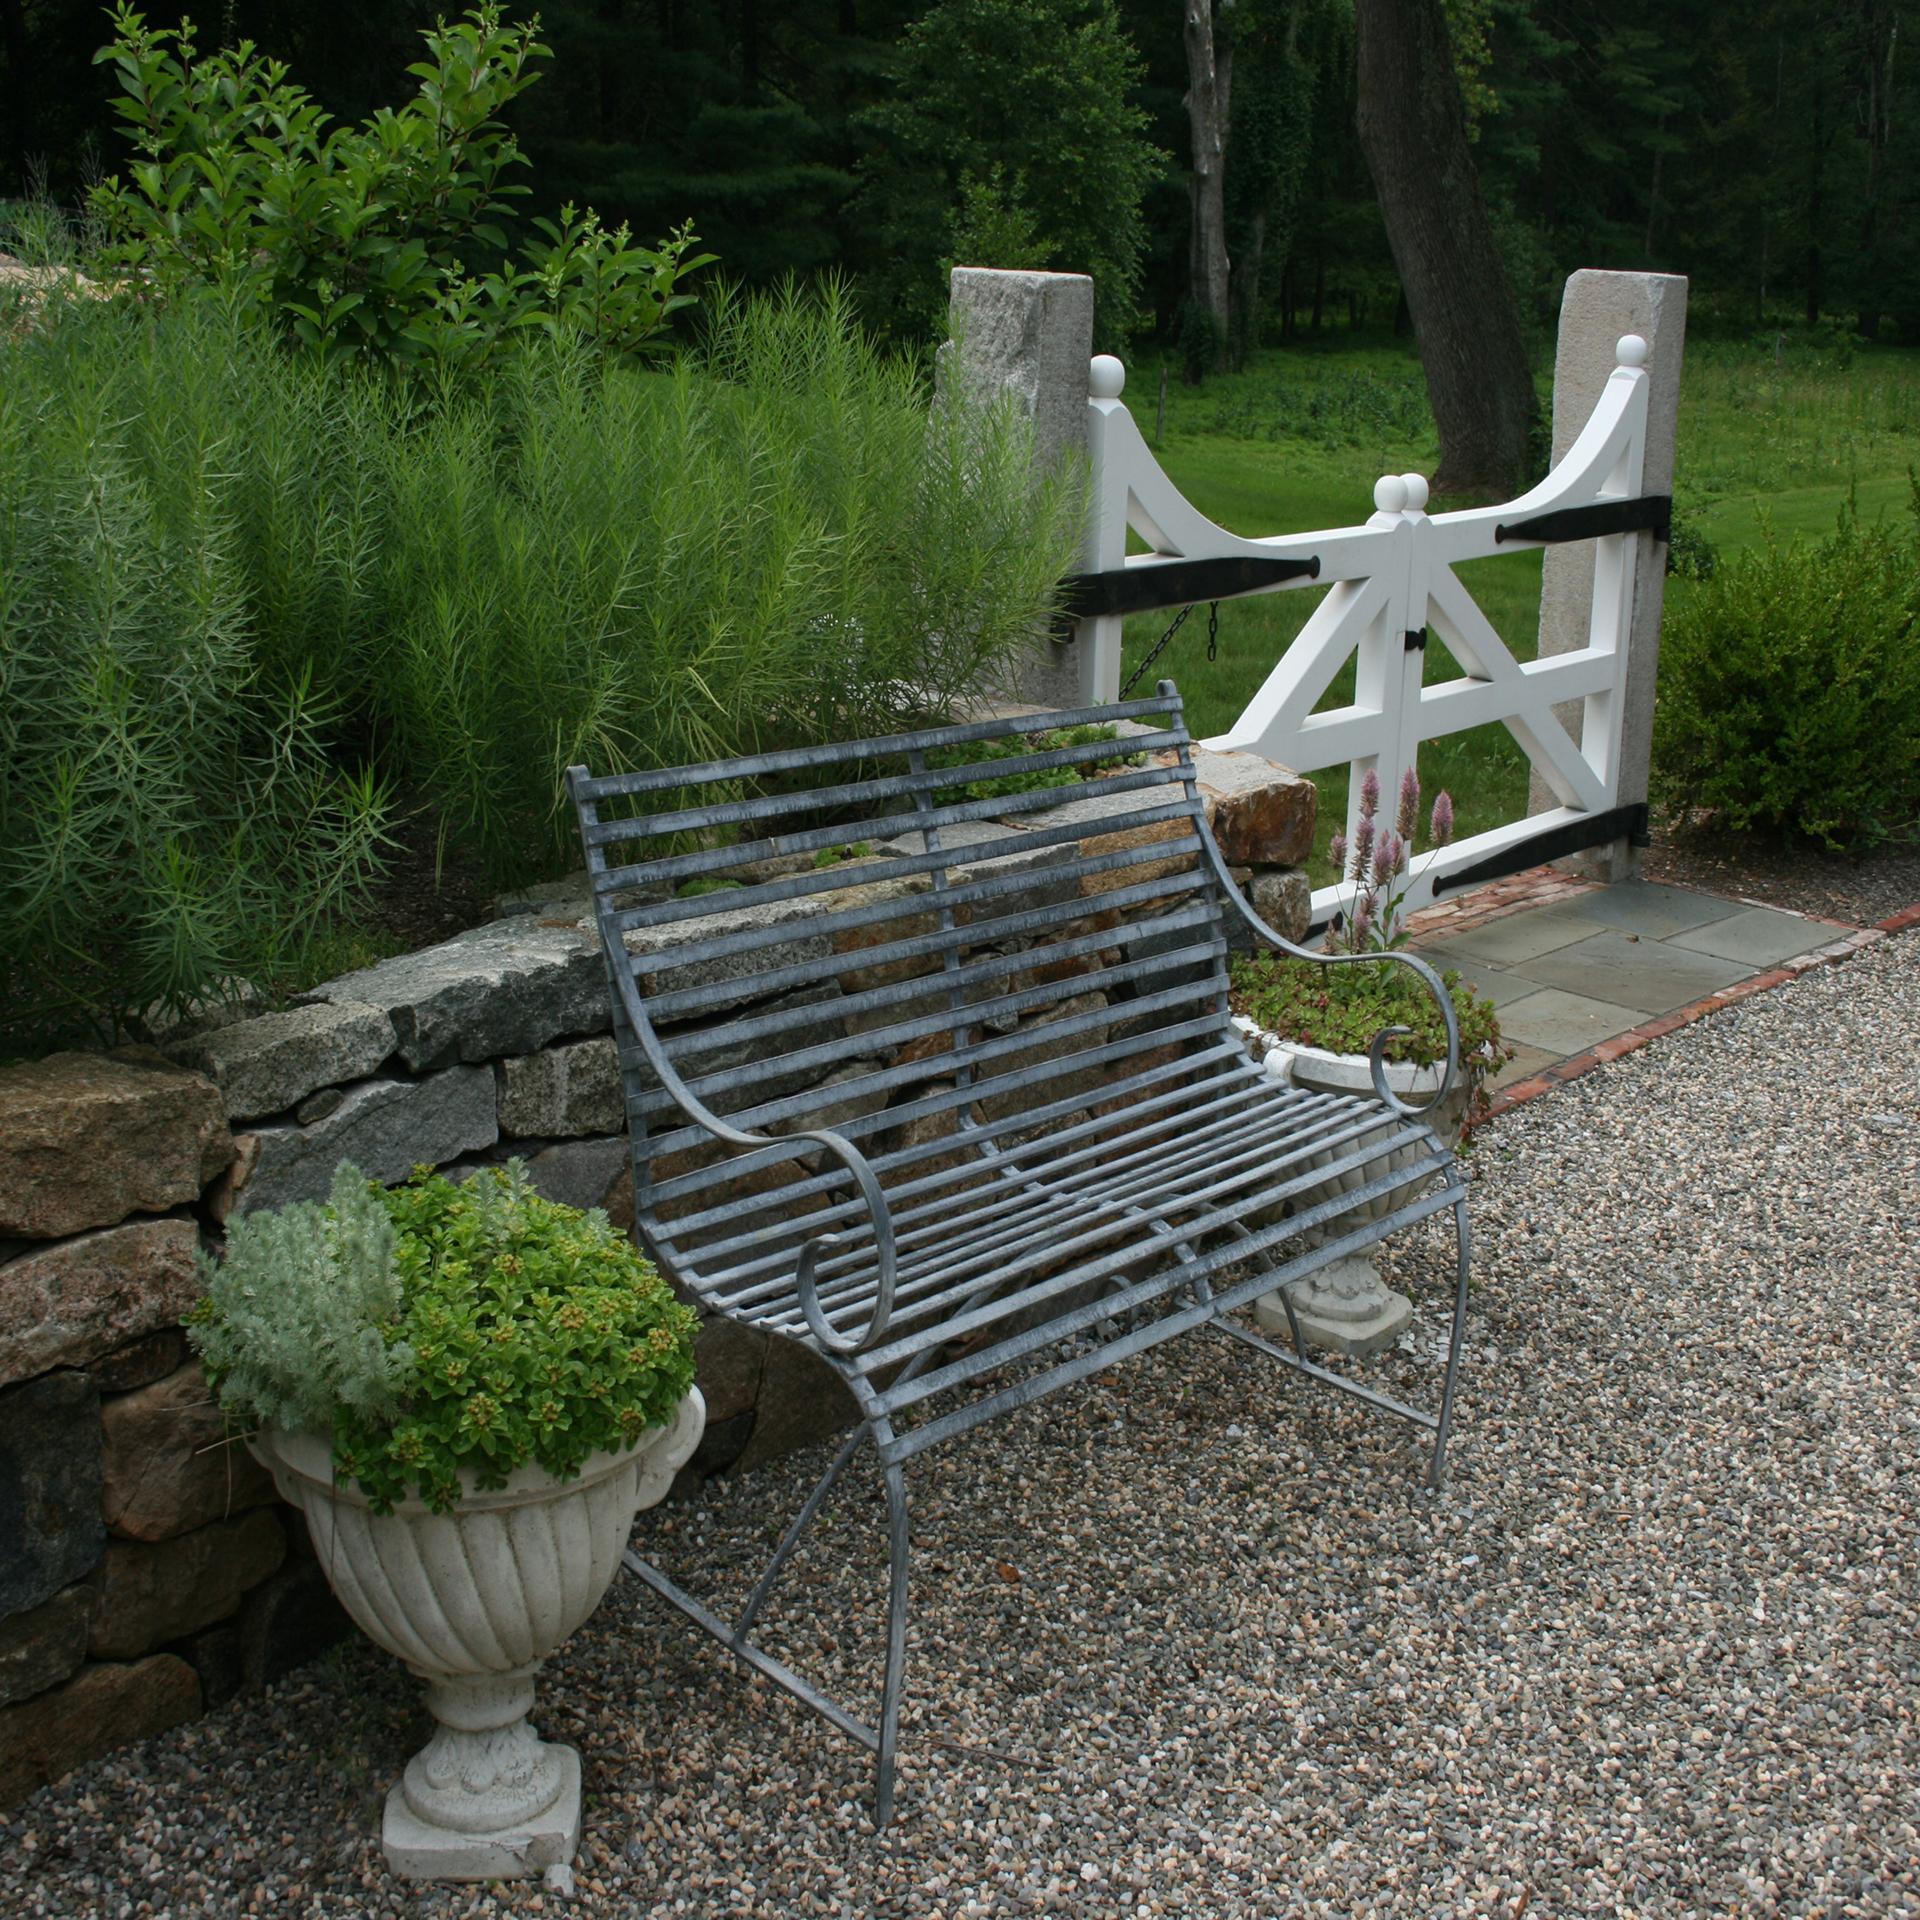 courtyard-garden-bench-gravel-path-newtown-square-pa